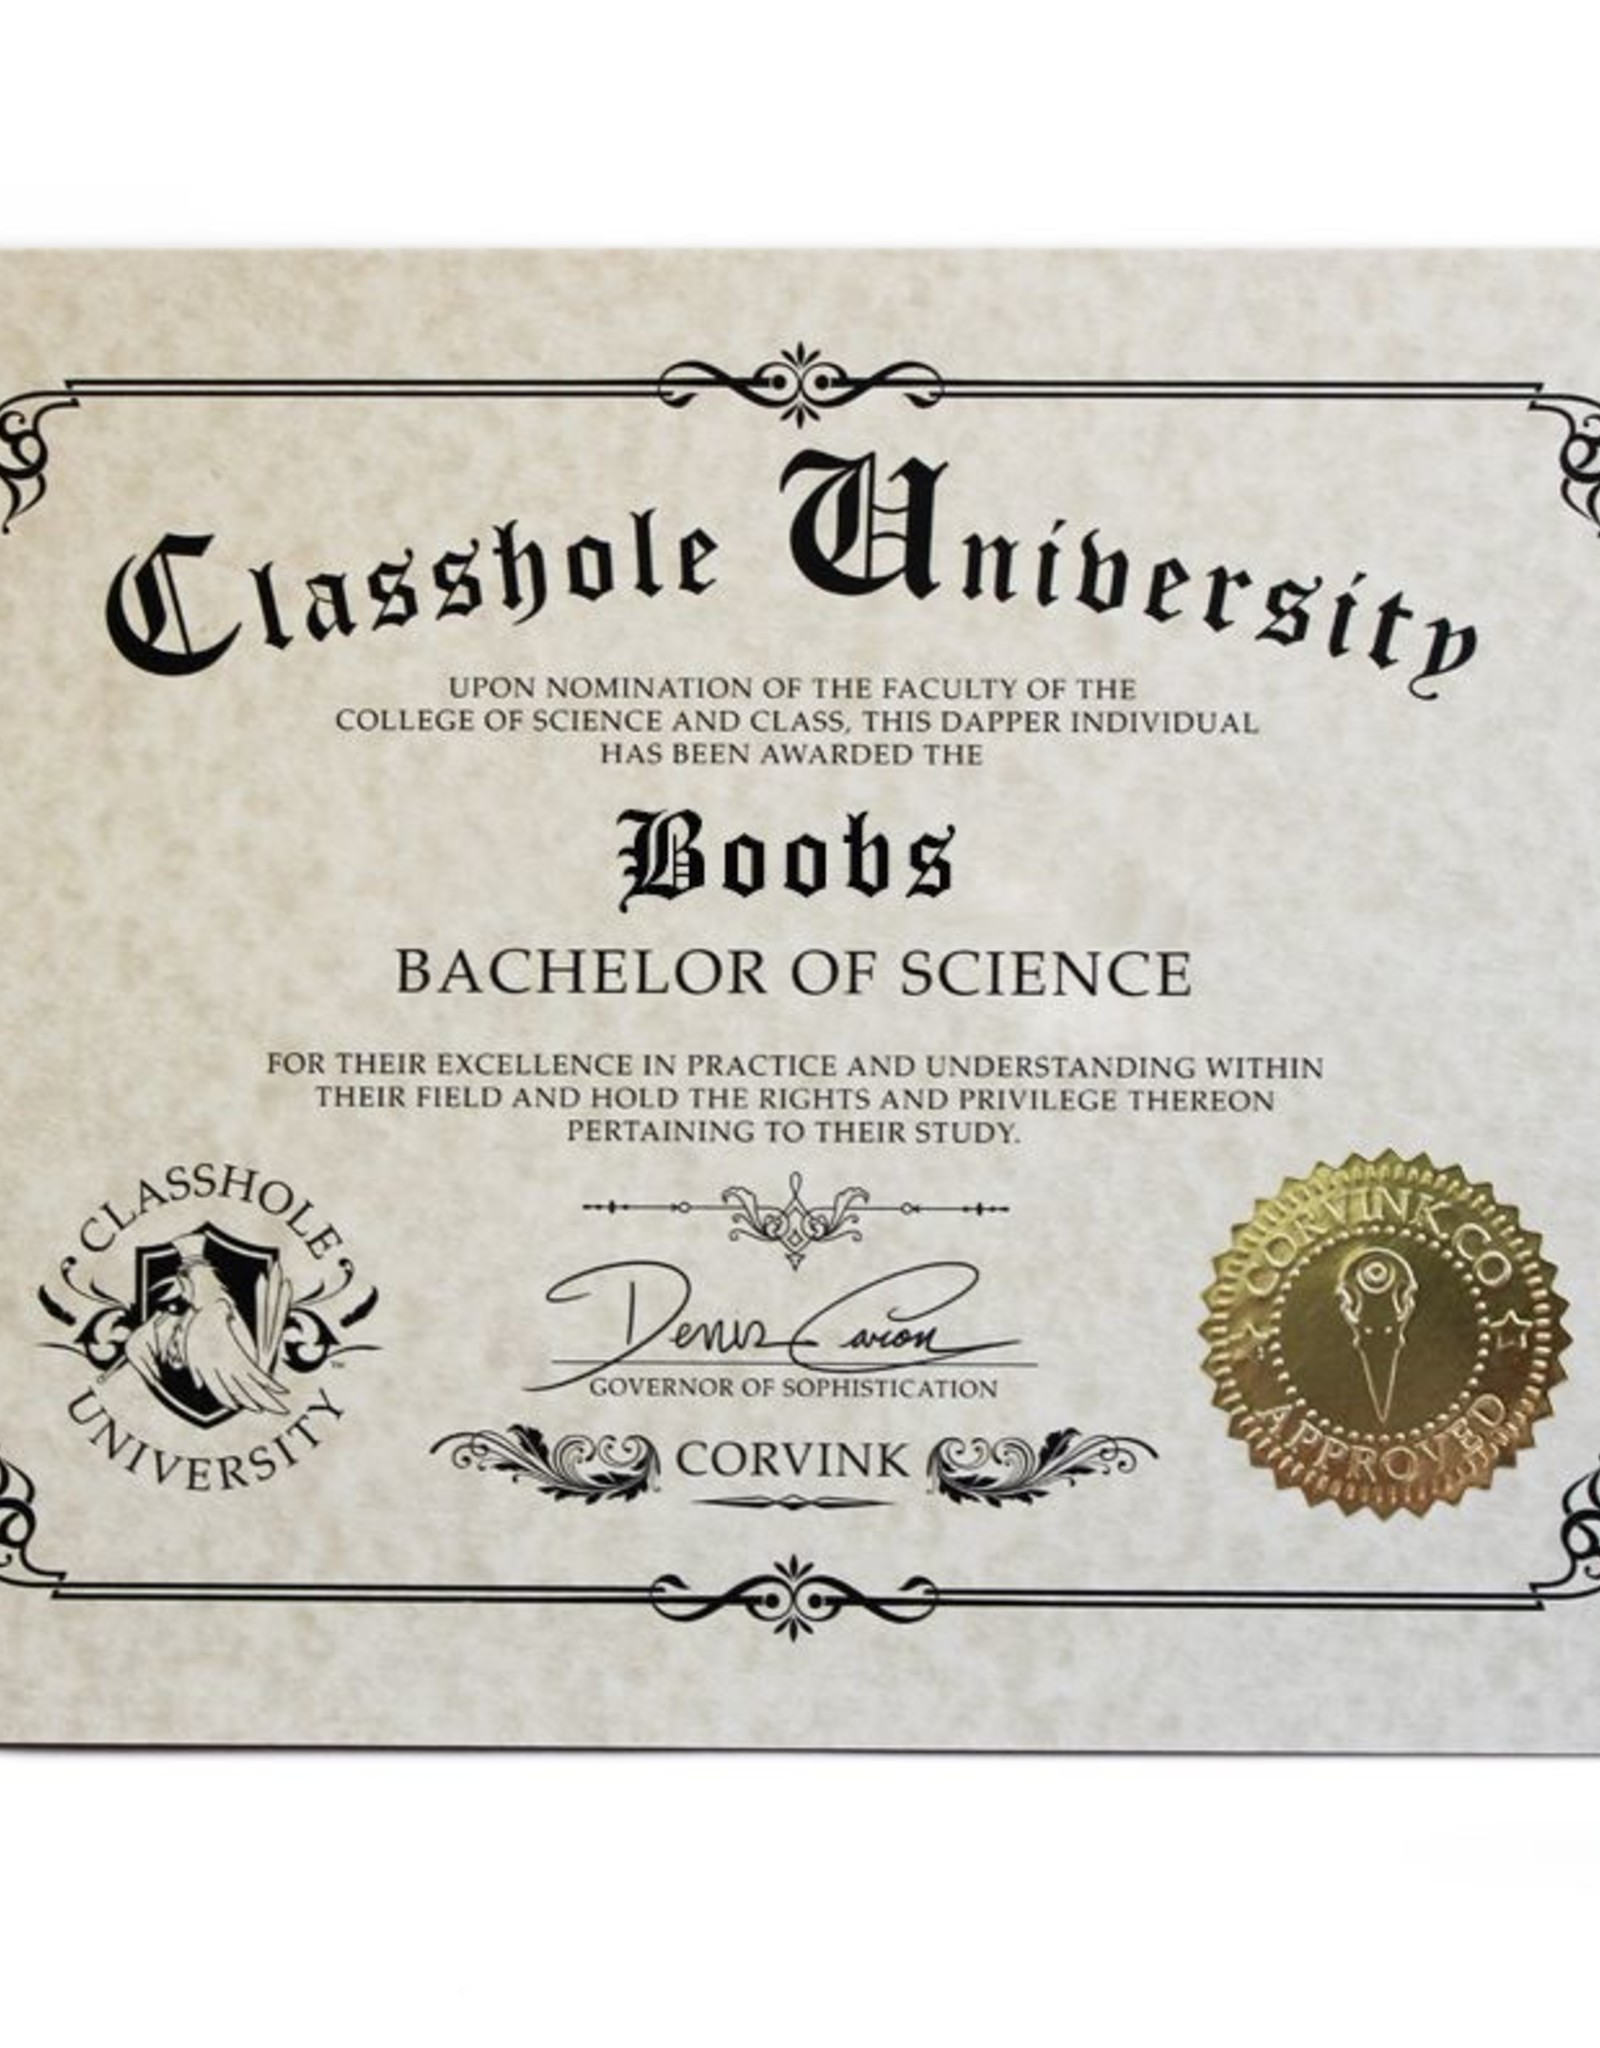 Classhole University BS Diplomas - Boobs